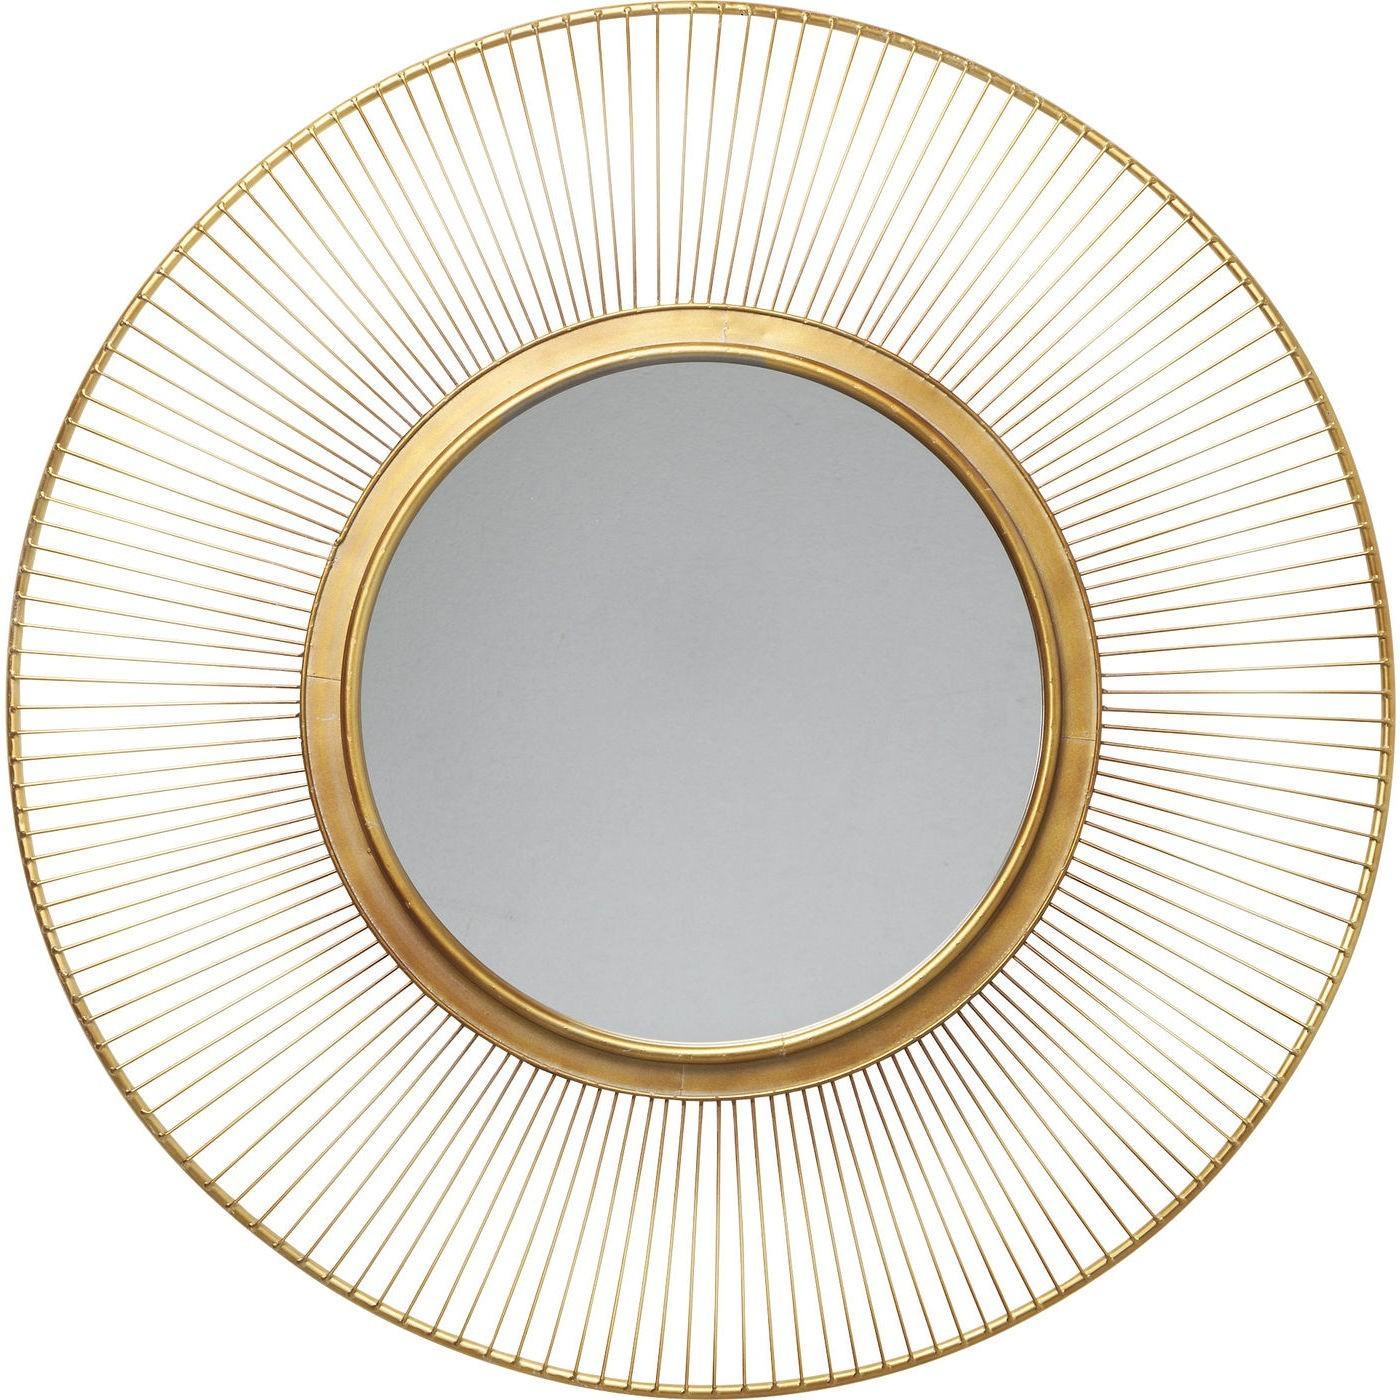 Miroir rond en métal doré D93